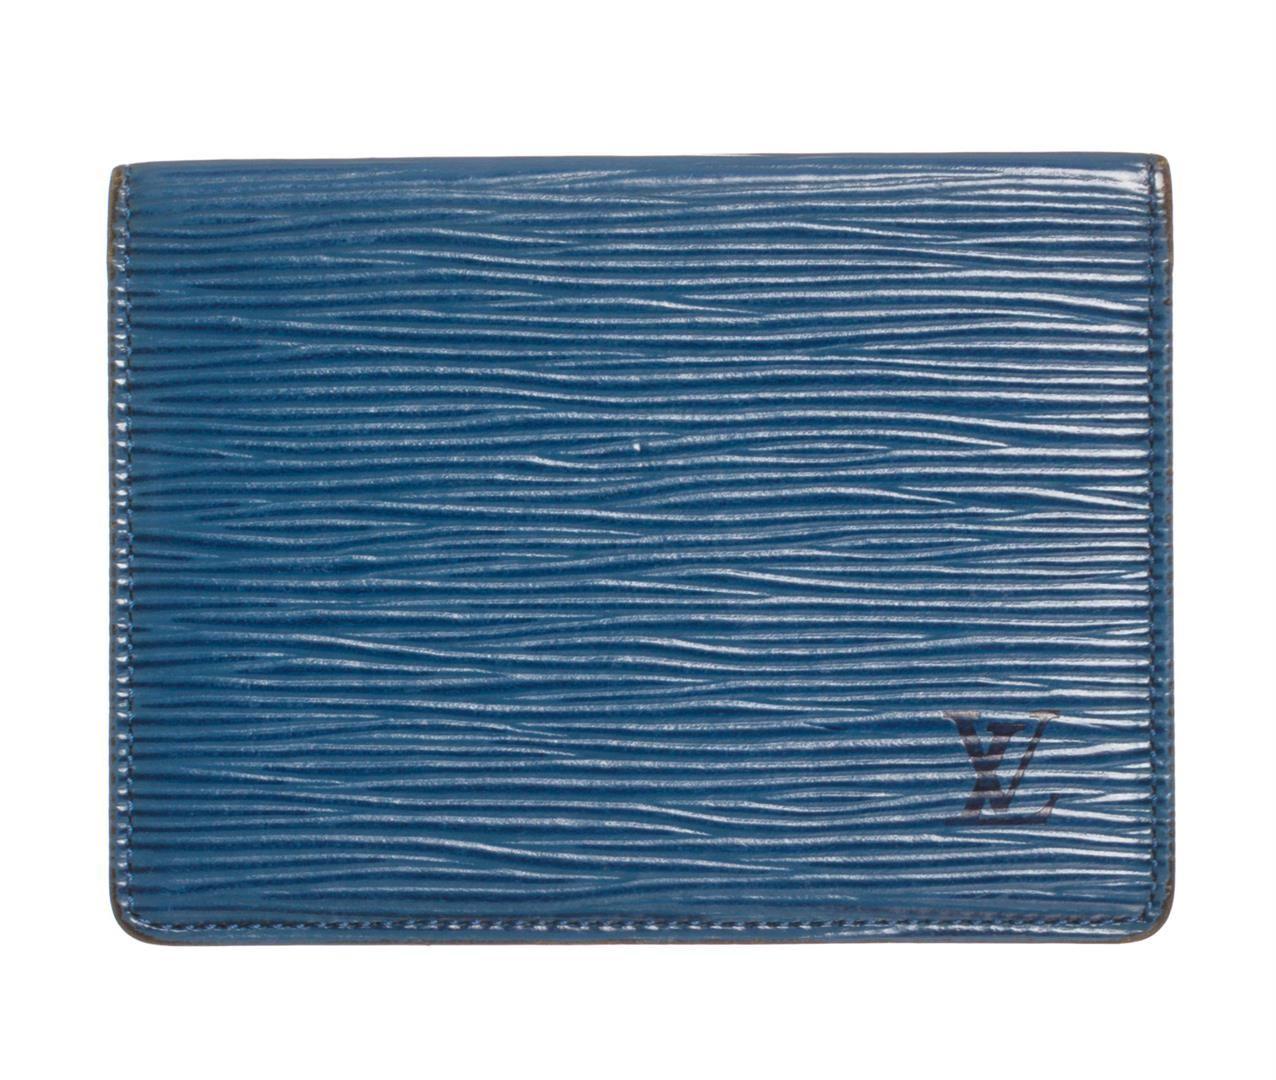 13a6561e Louis Vuitton Blue Epi Leather ID Card Holder Wallet